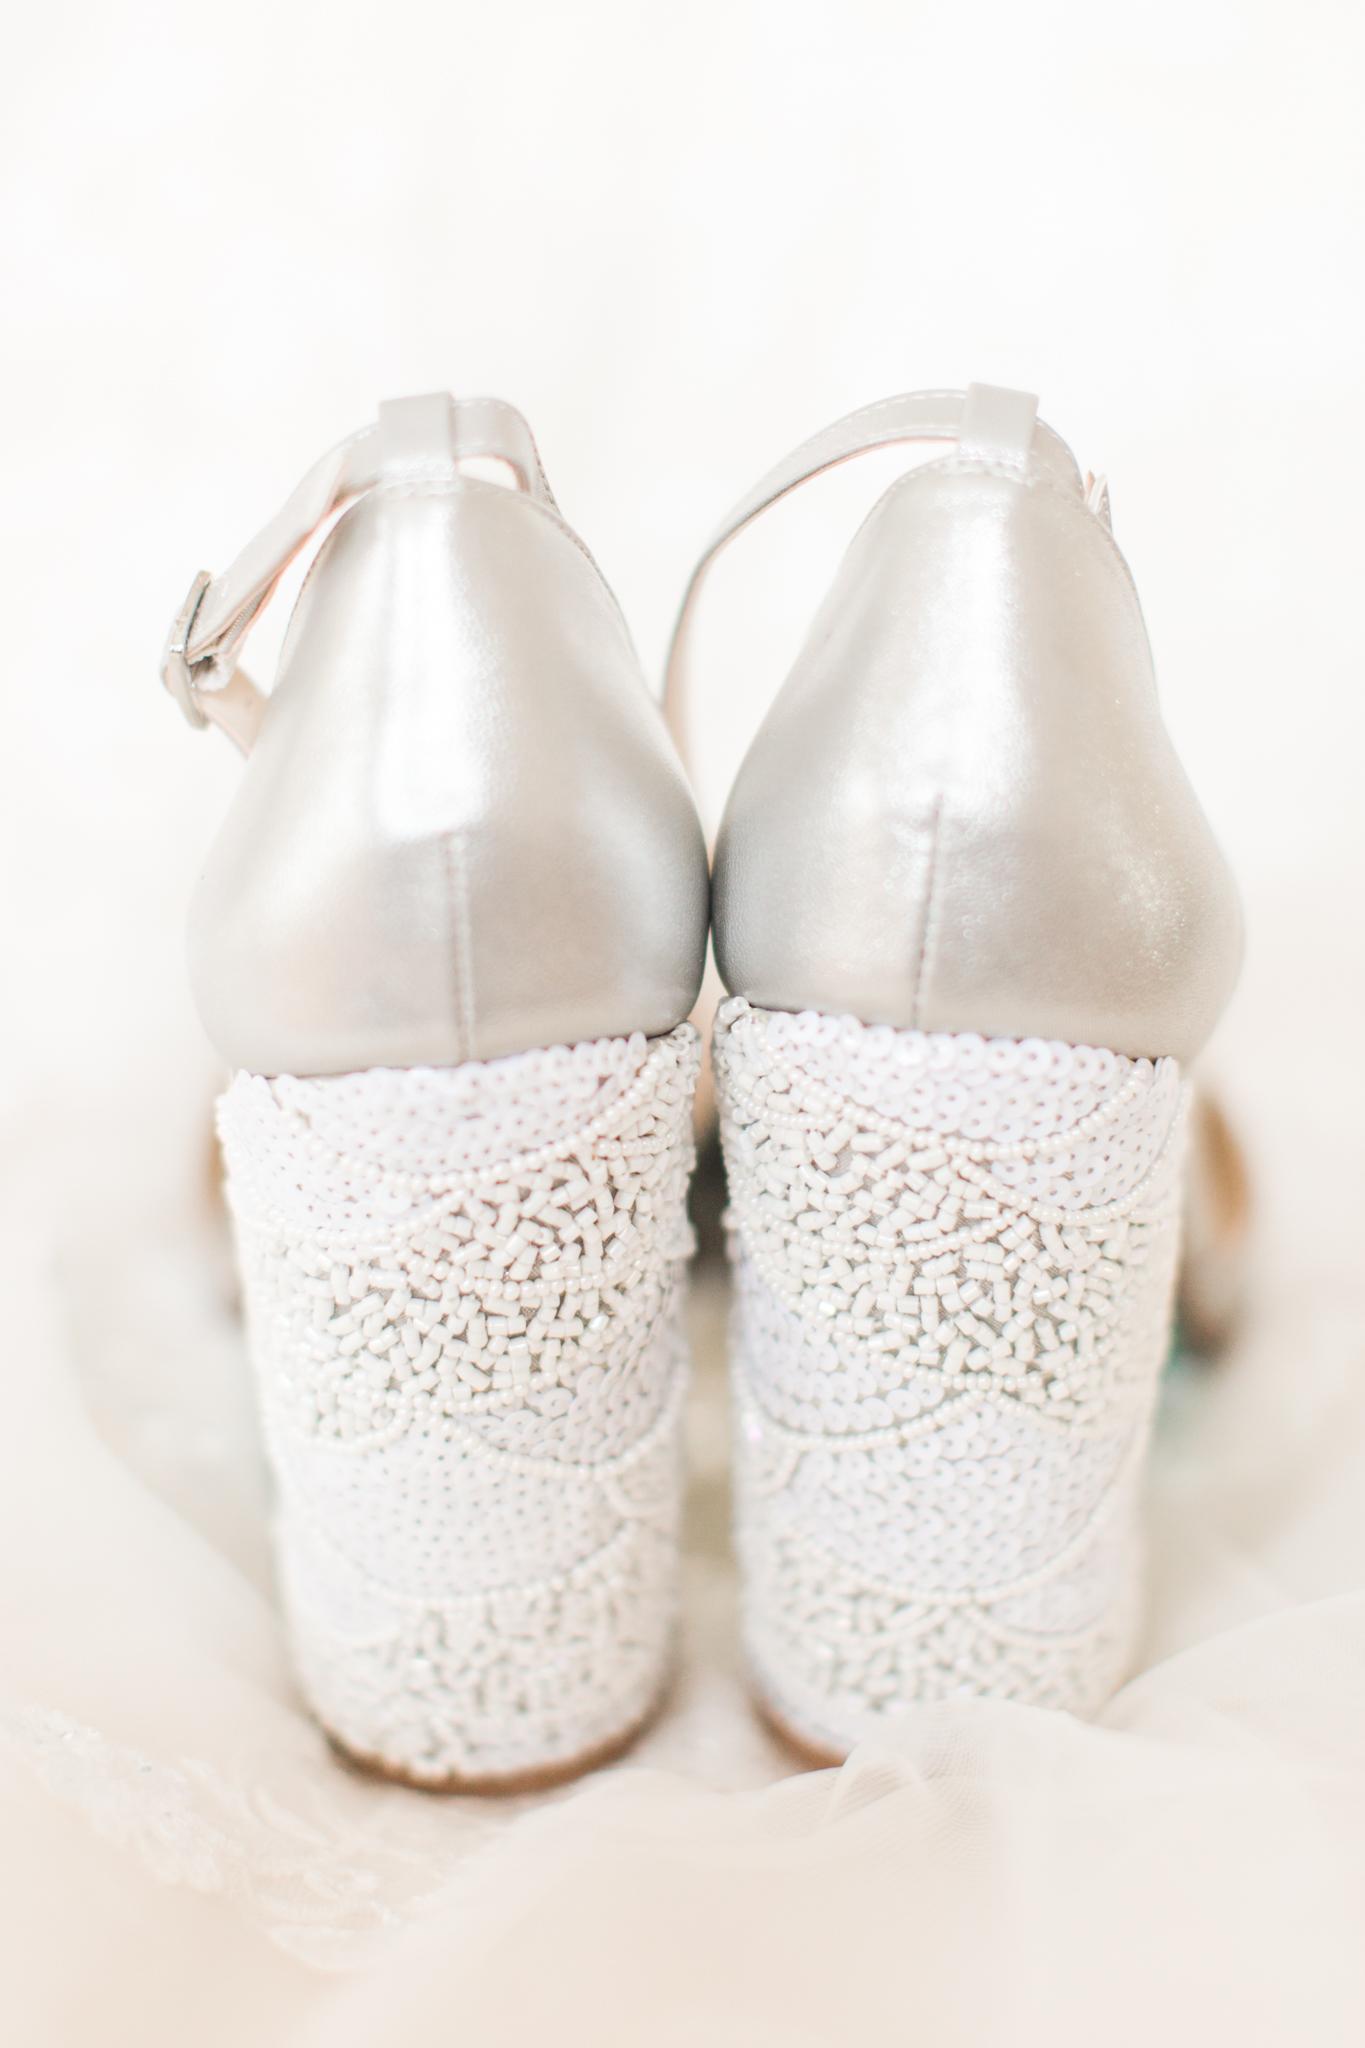 Haley Mansion Winter Wedding - Shaina Lee Photography-24.jpg